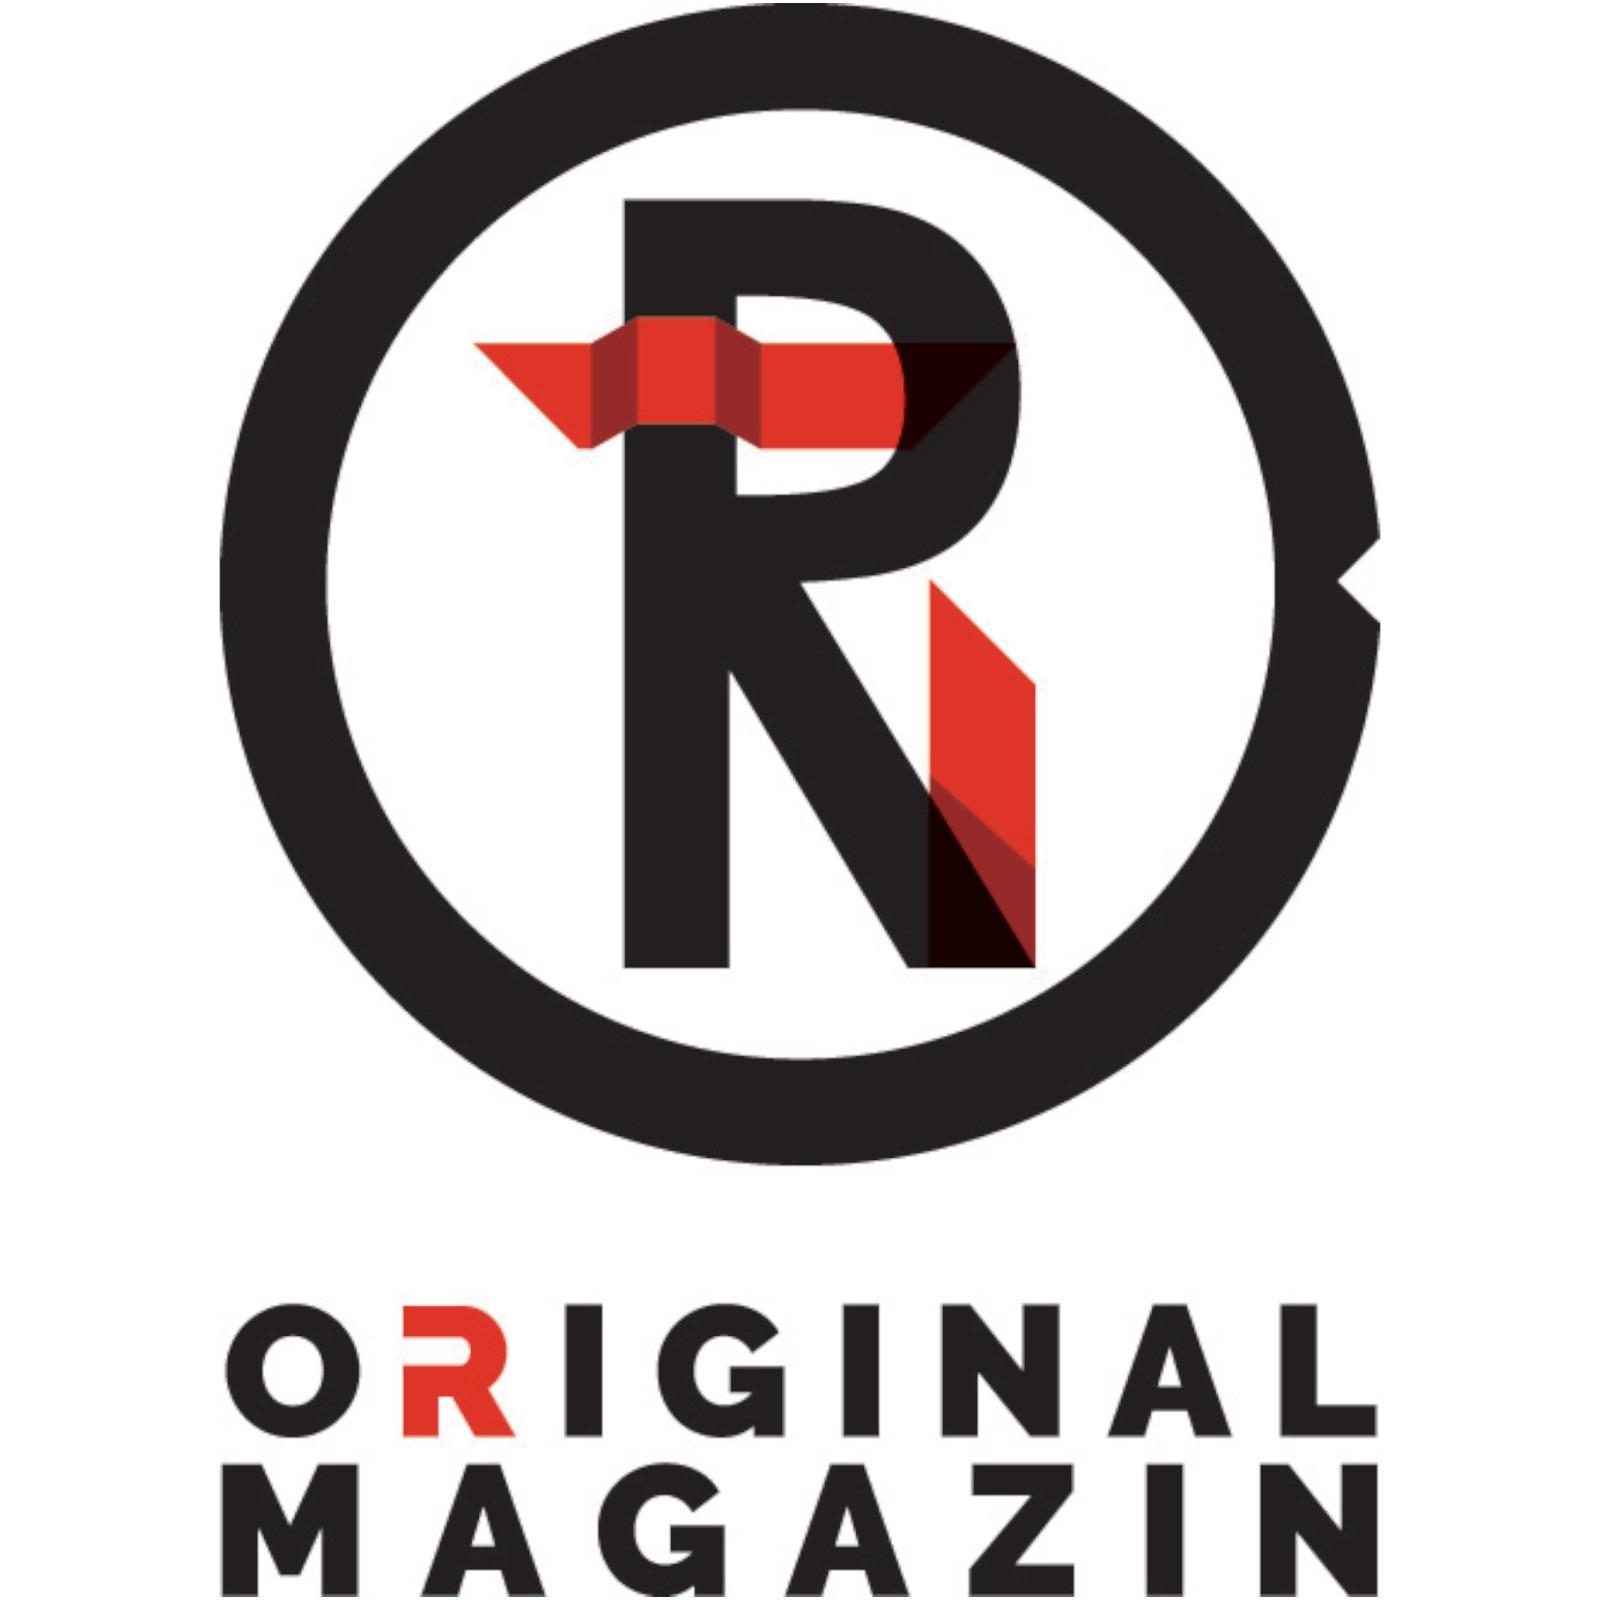 ORIGINAL MAGAZIN Logo